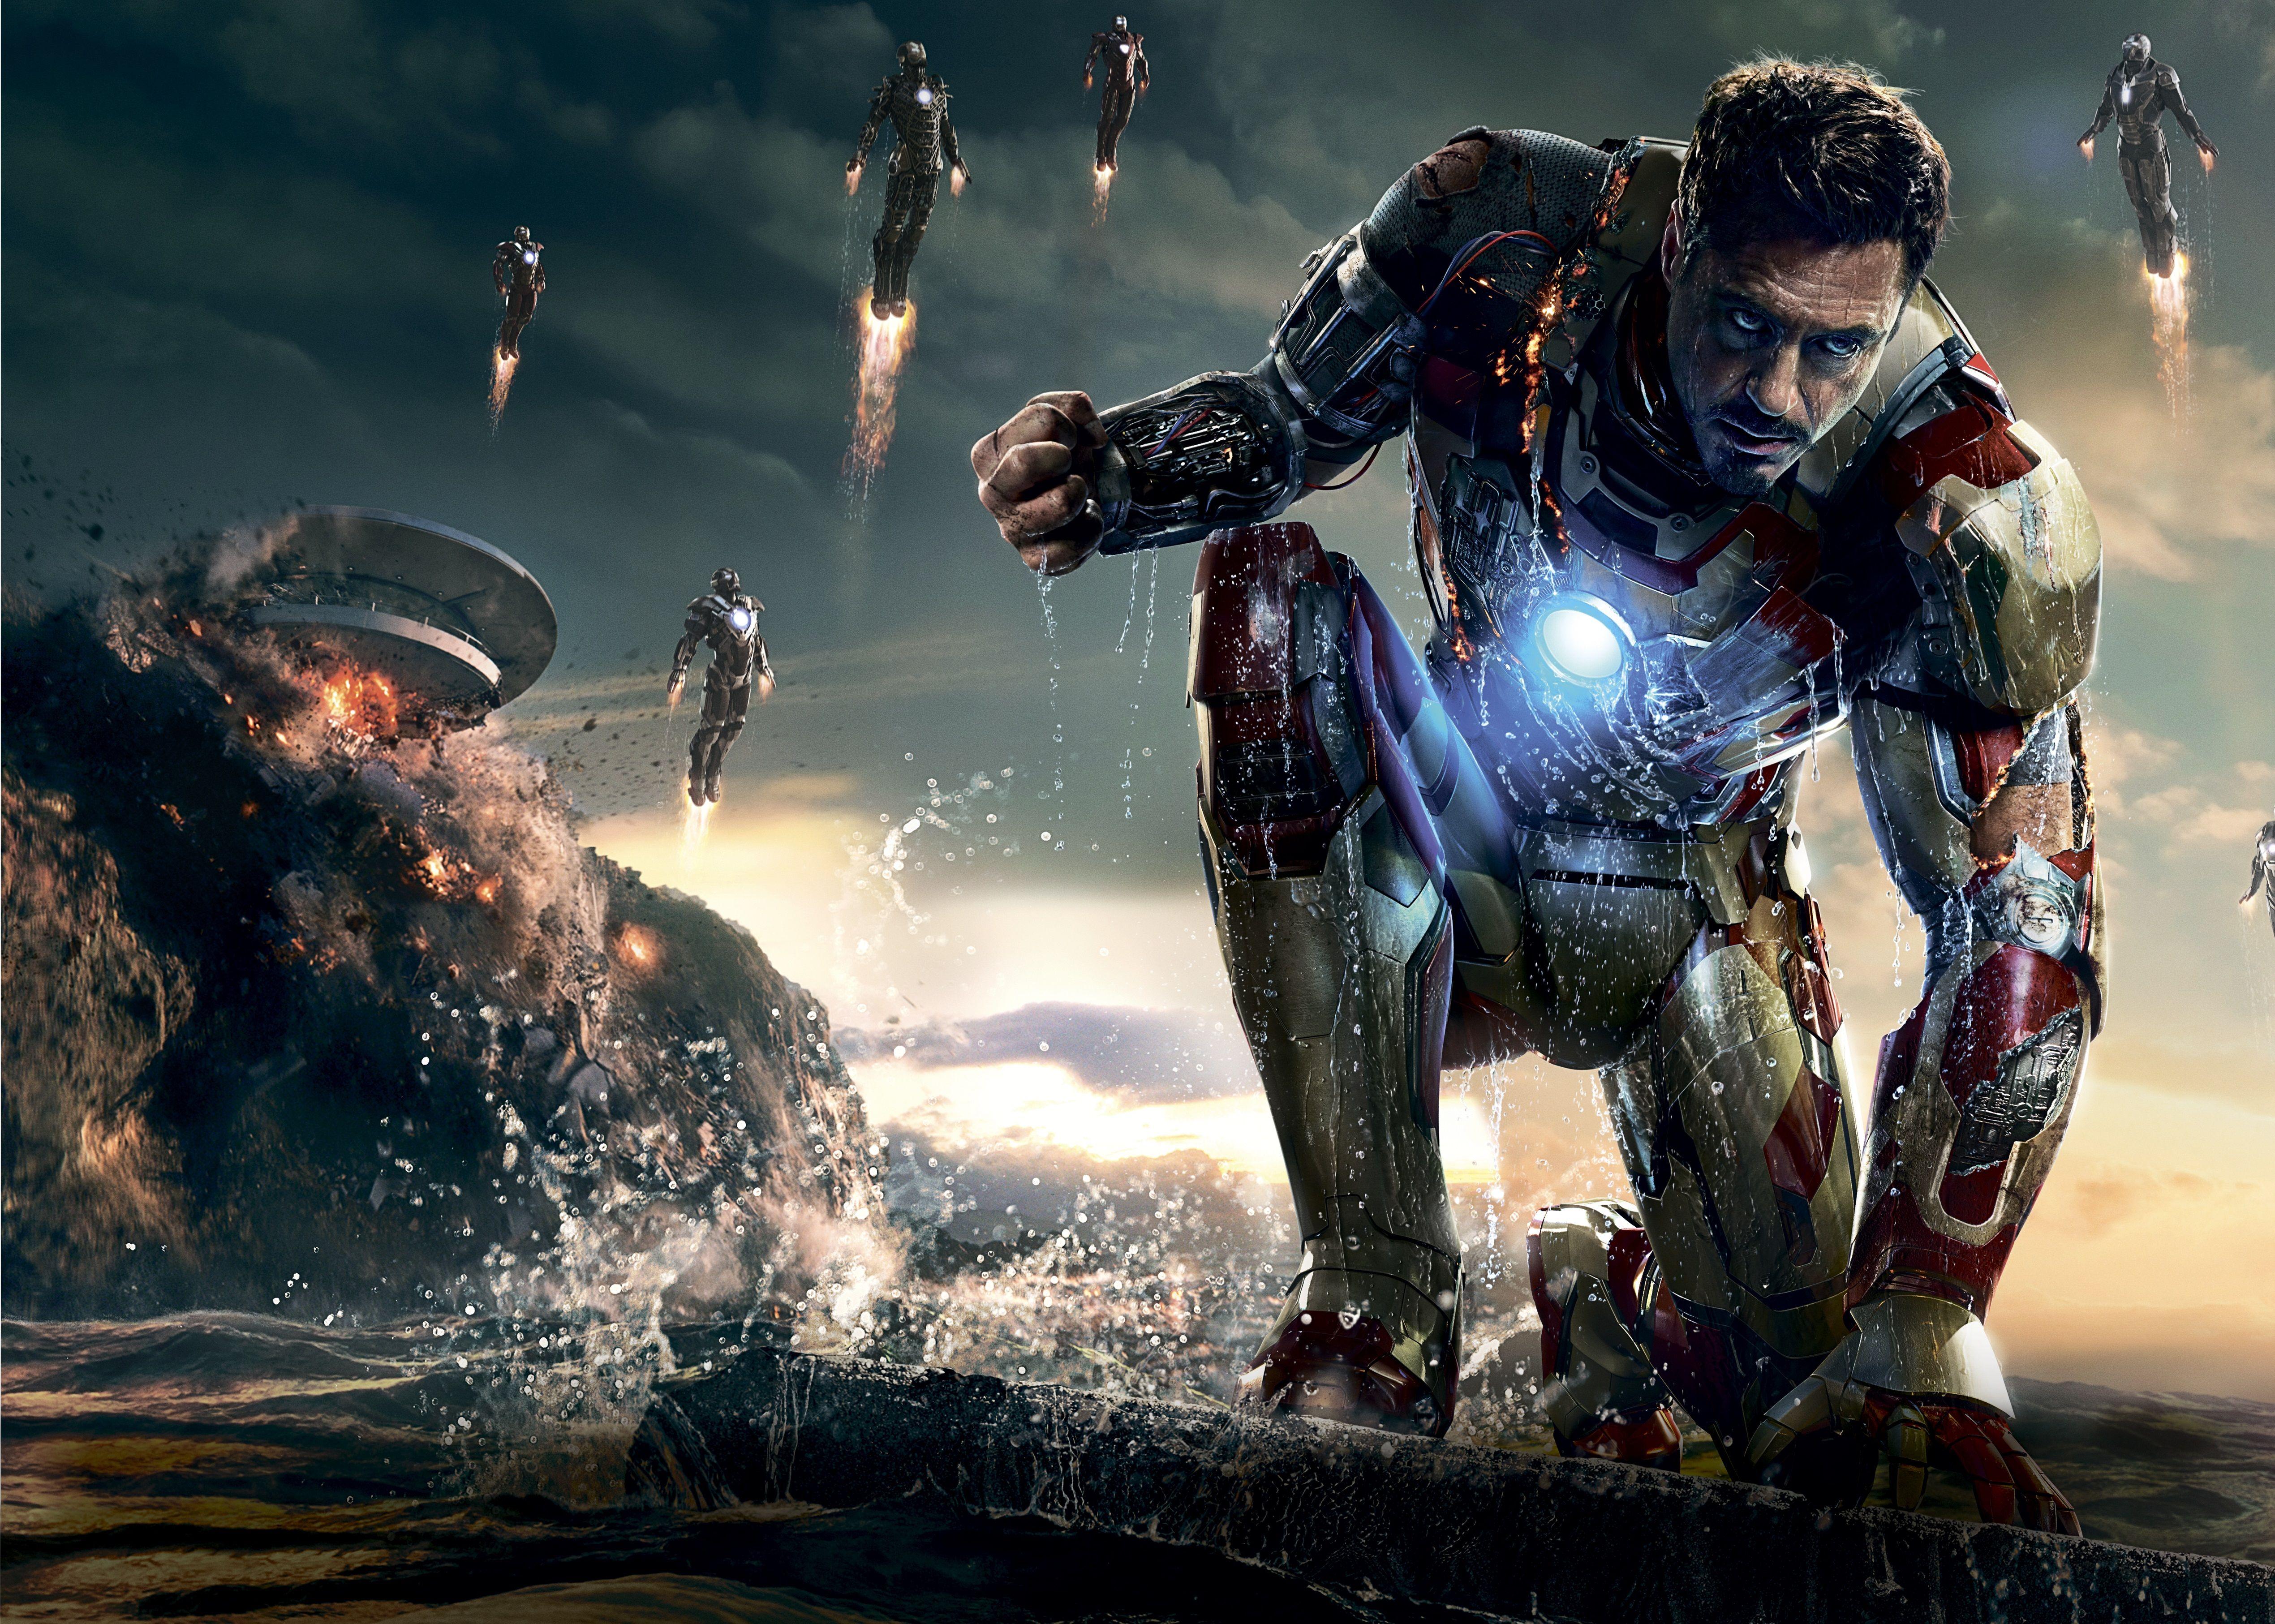 iron man 3 - textless movie poster | movie promos, stills & posters